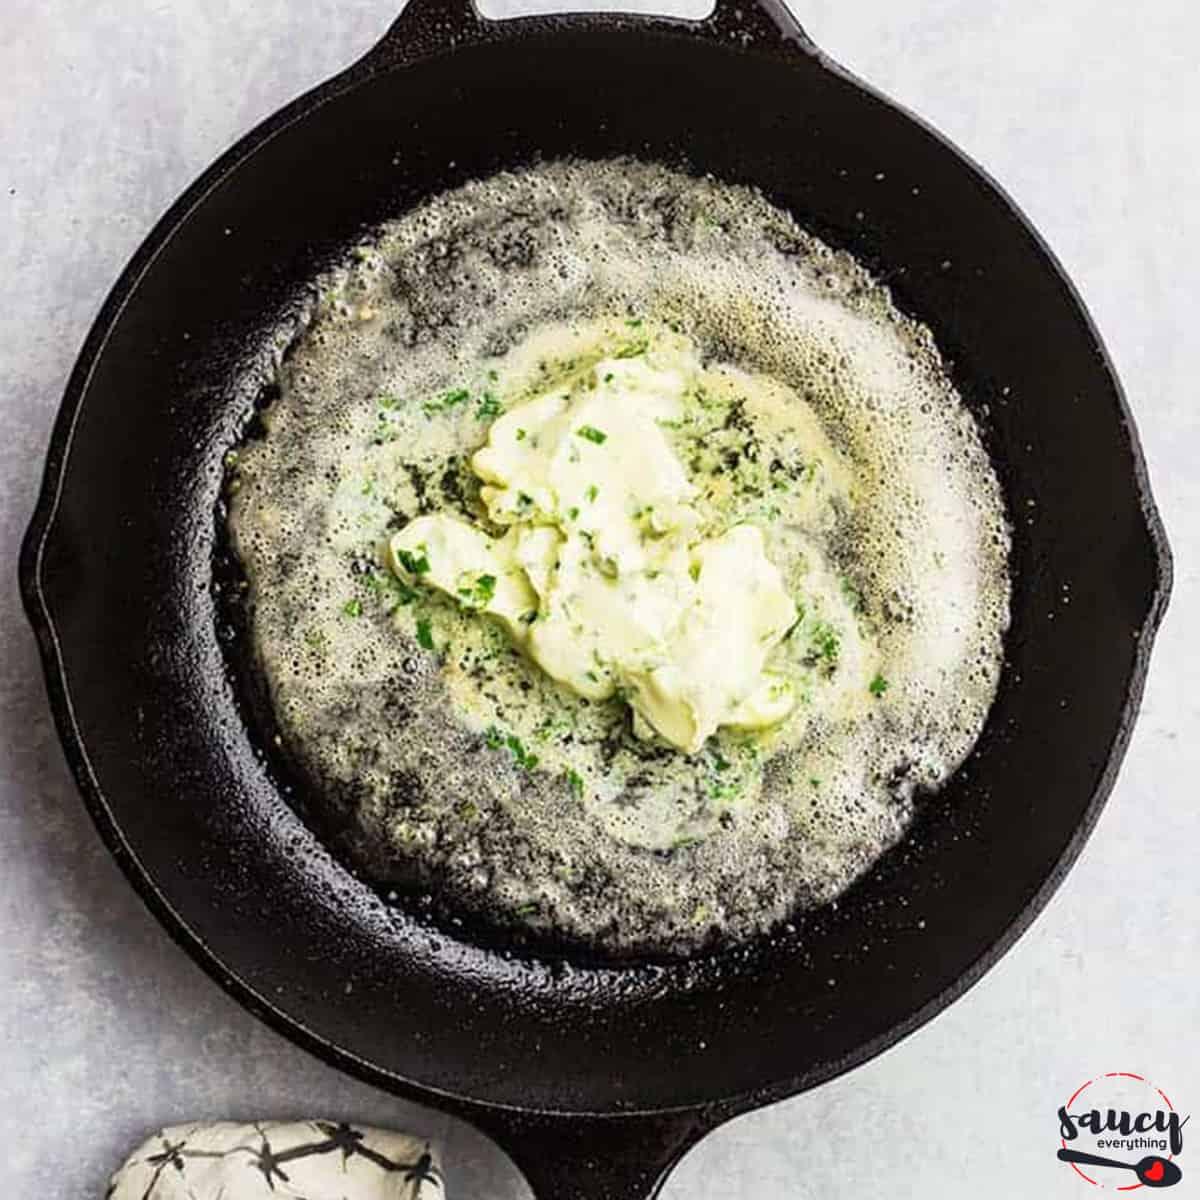 garlic butter sauce melting in a skillet